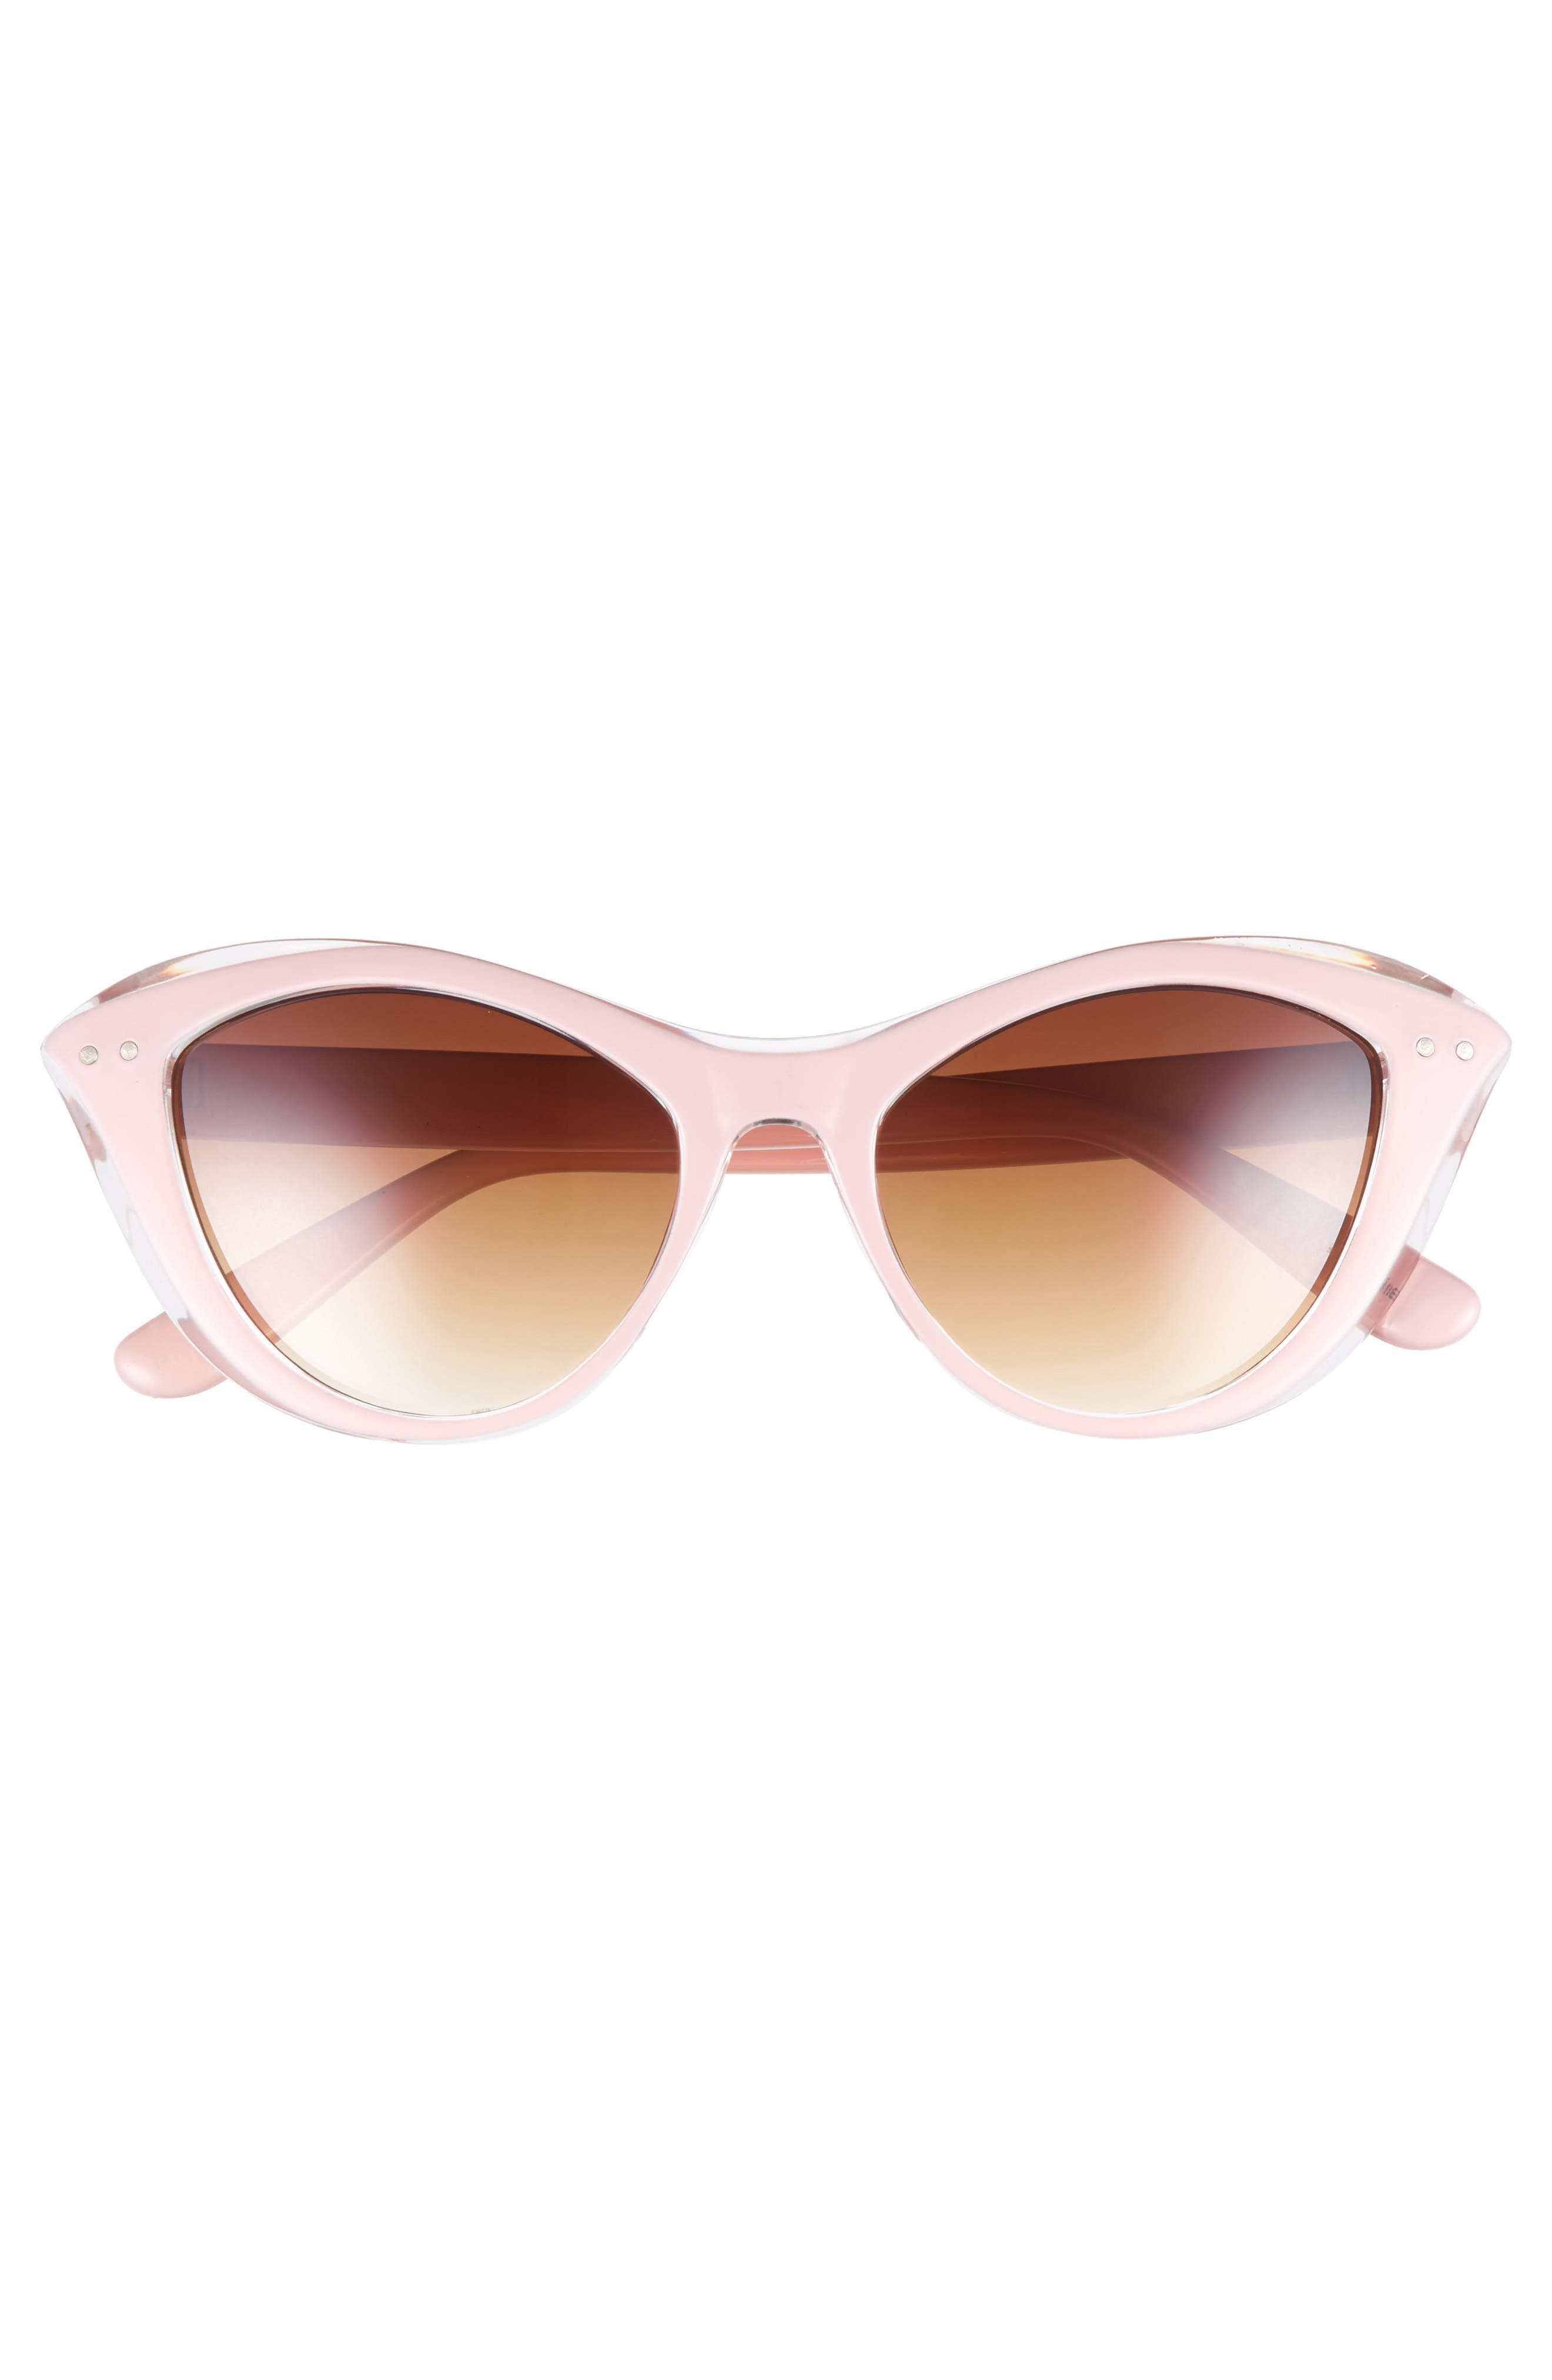 50mm Retro Cat Eye Sunglasses,                             Alternate thumbnail 3, color,                             Pink